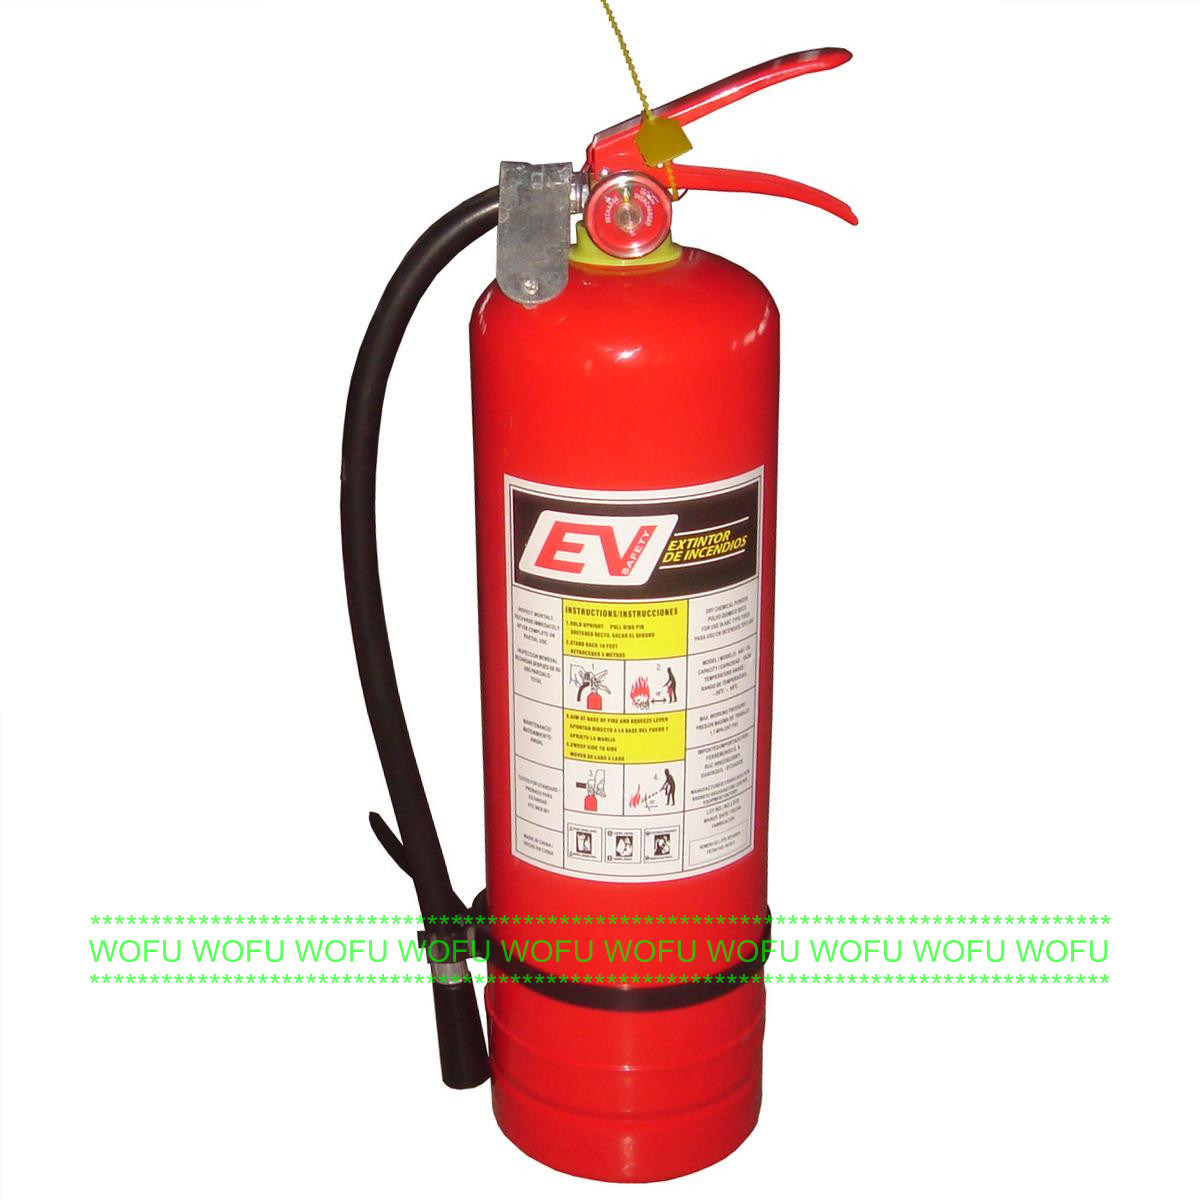 10lbs ABC Dry Powder Fire Extinguisher